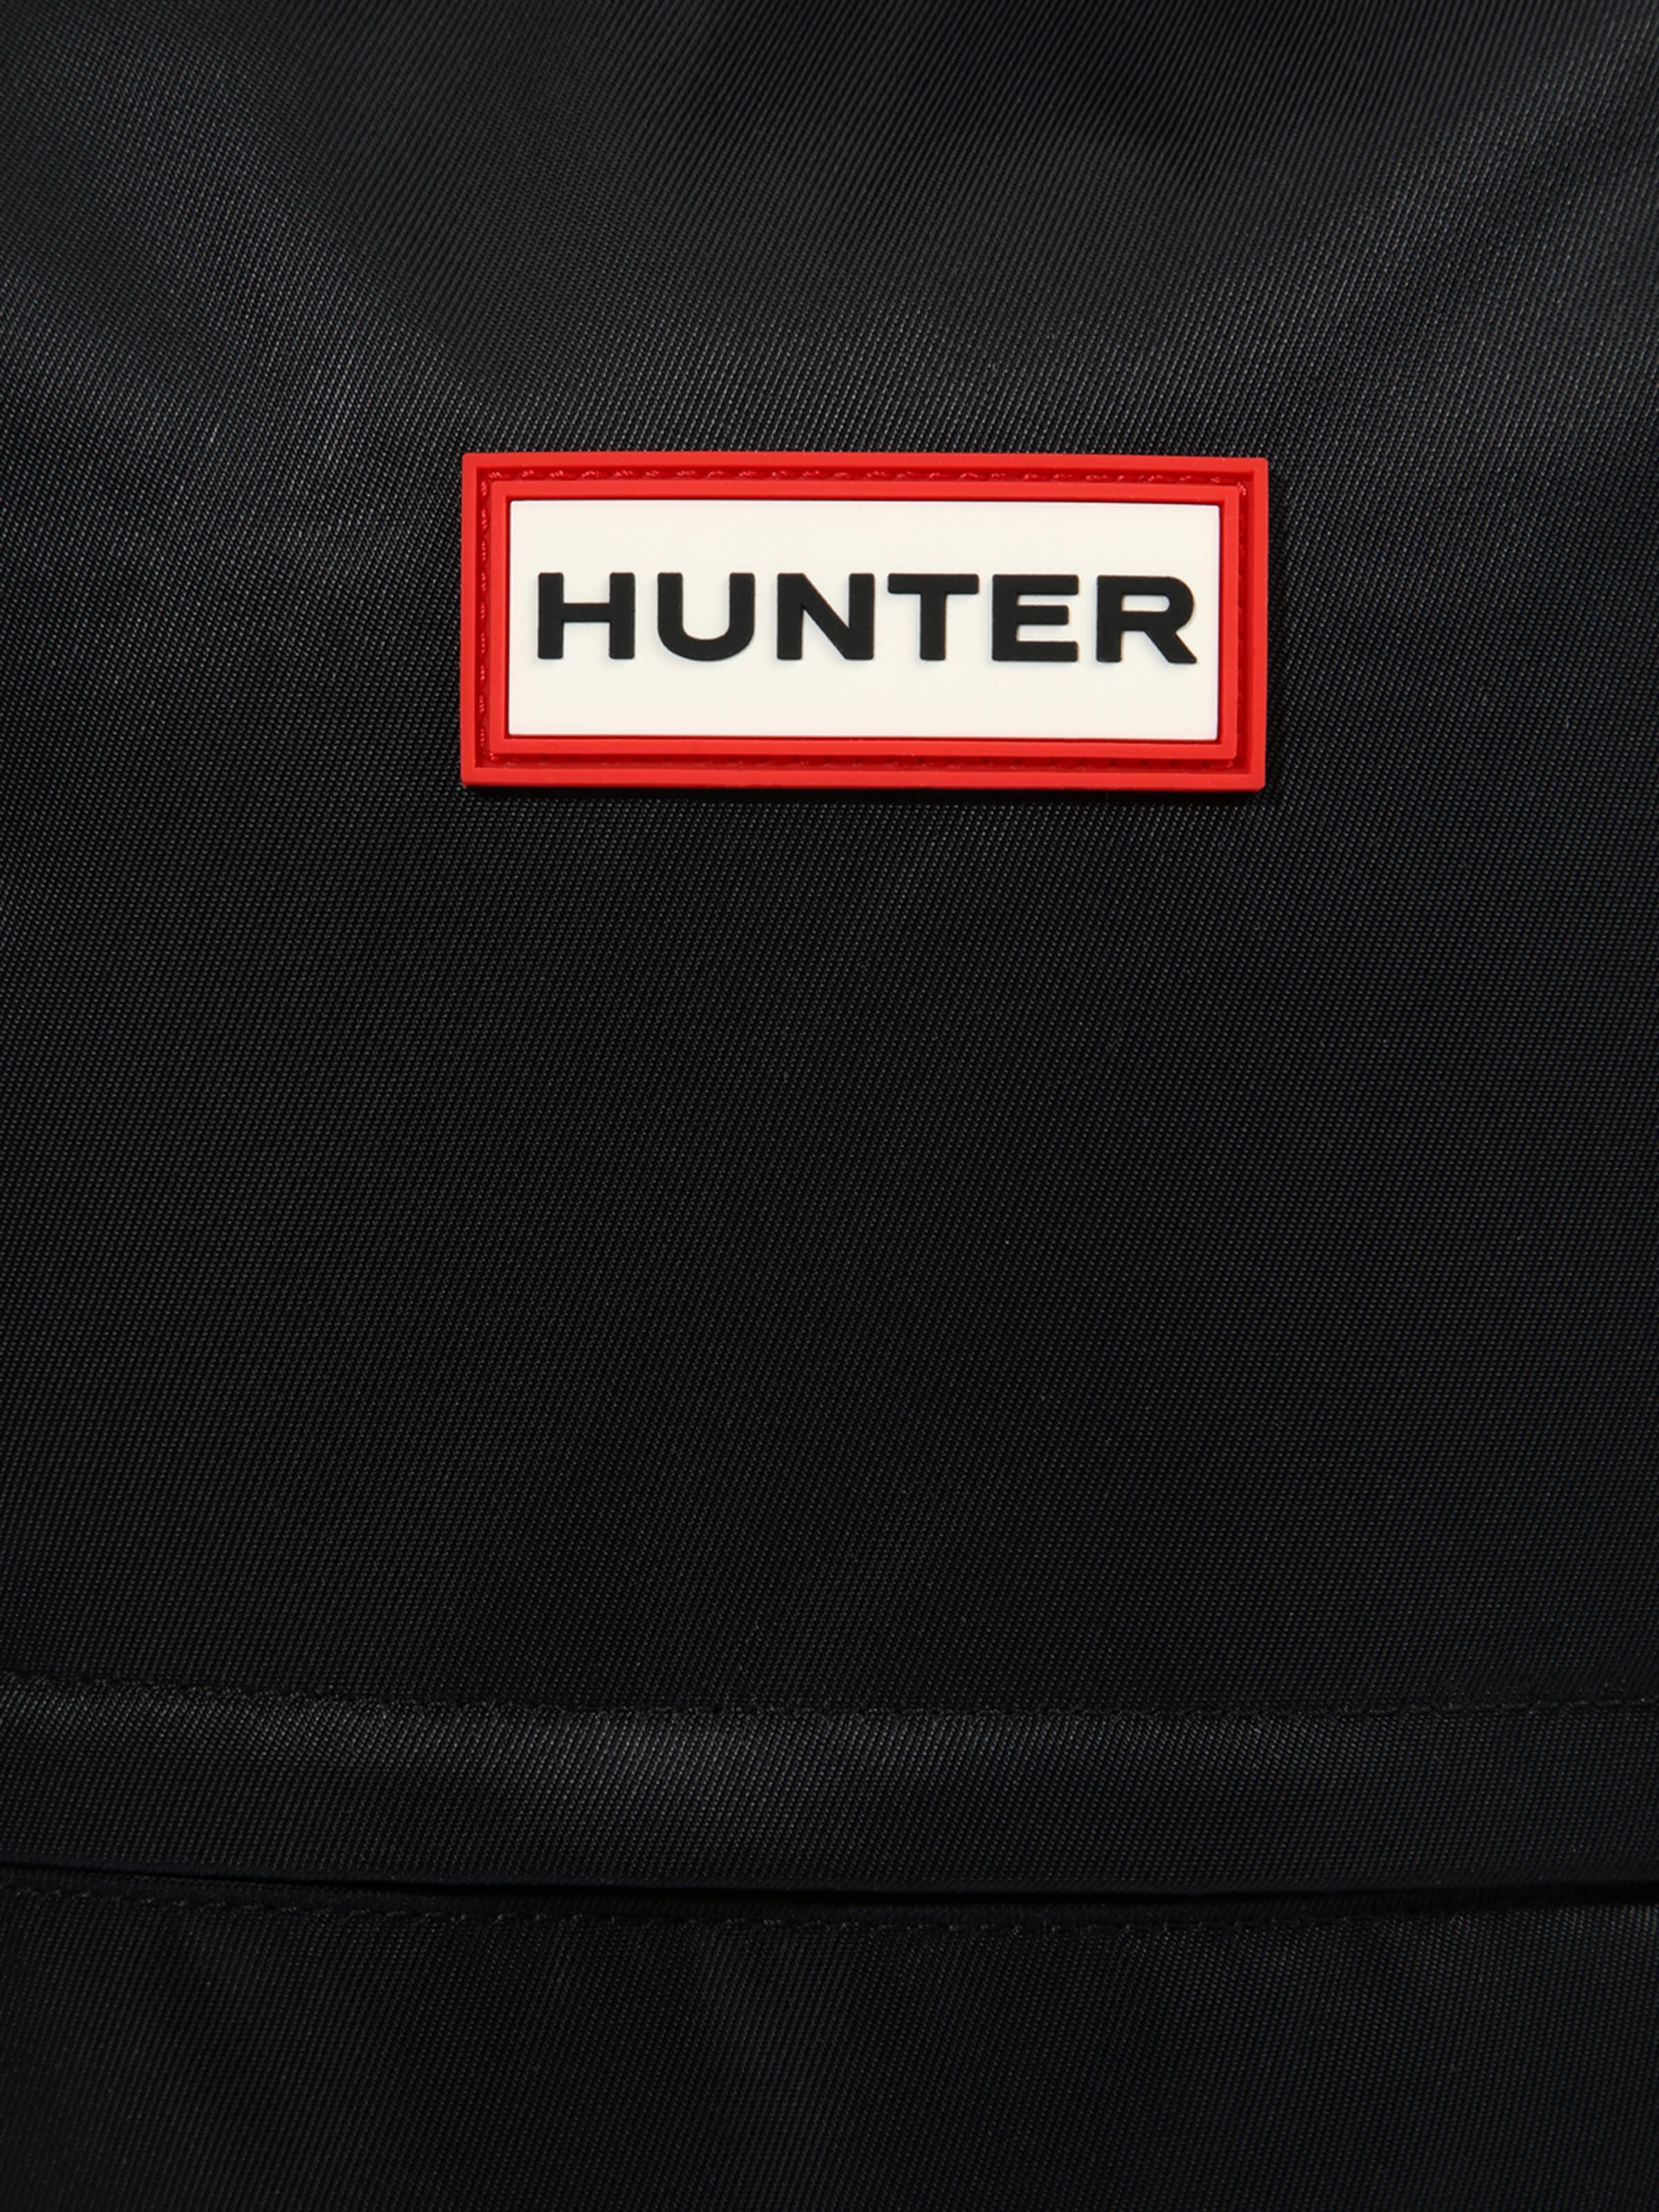 Rouge Sac Backpack' En Hunter Dos ClairNoir Blanc 'original À SzVqpMU